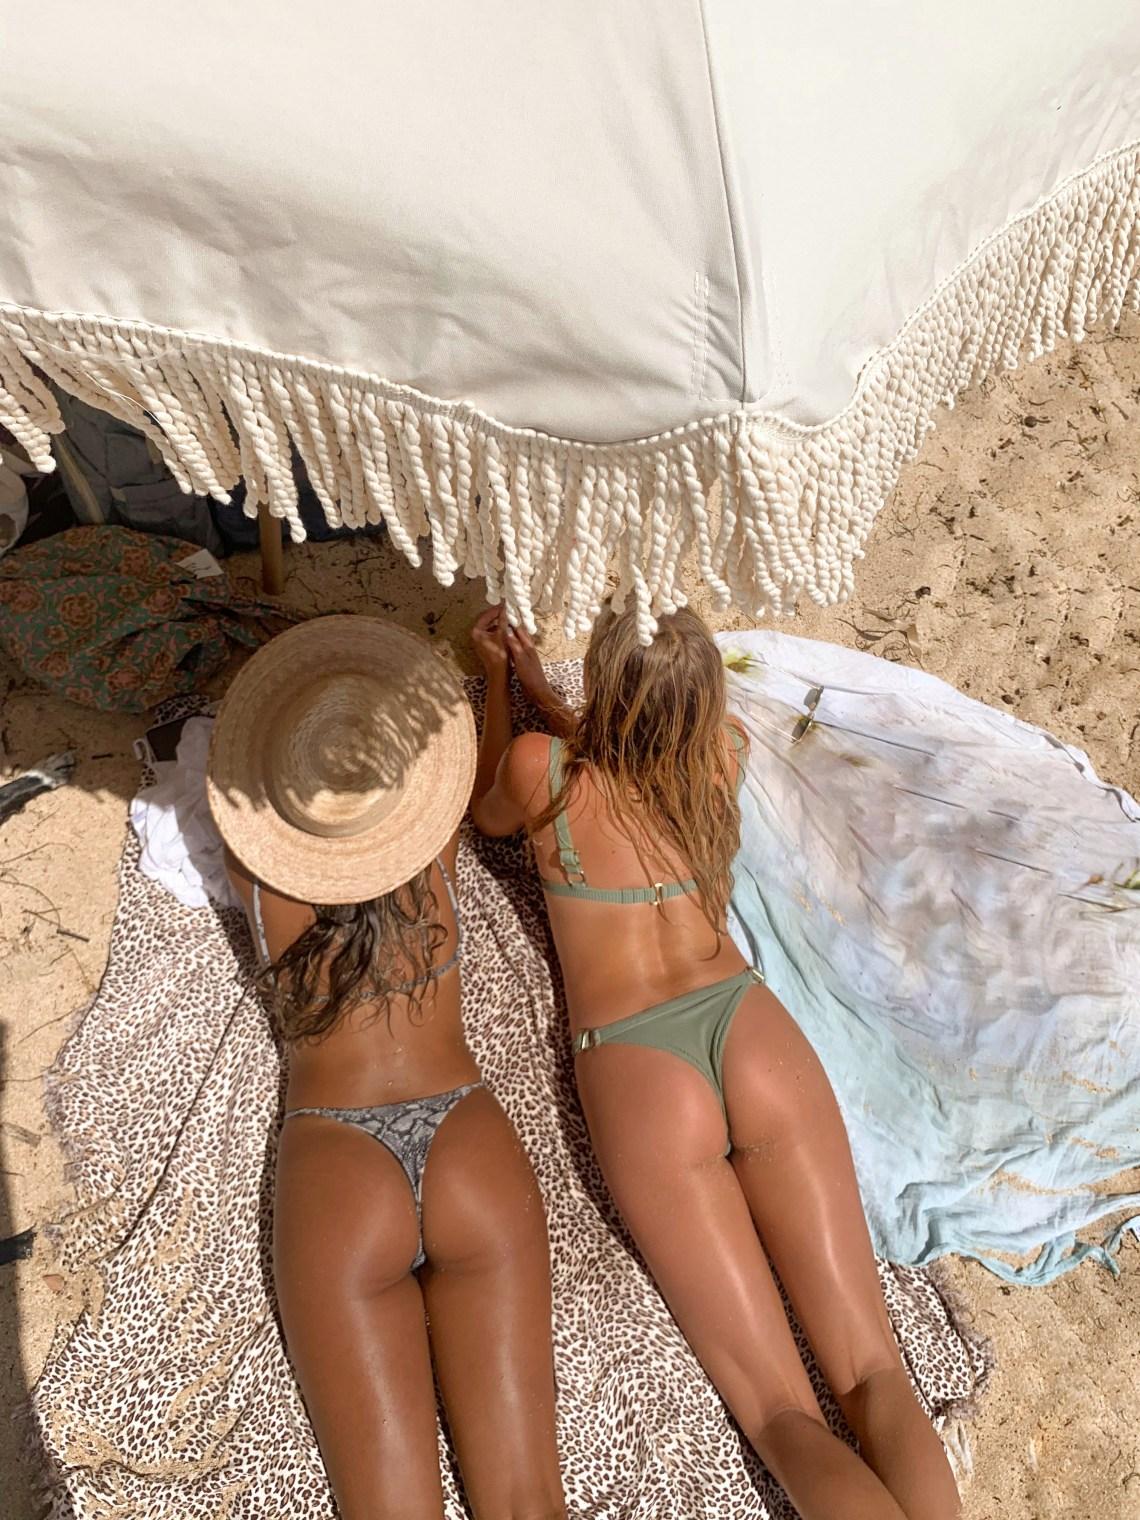 tanning tips - best beach umbrella -coconut girl aesthetic hawaii